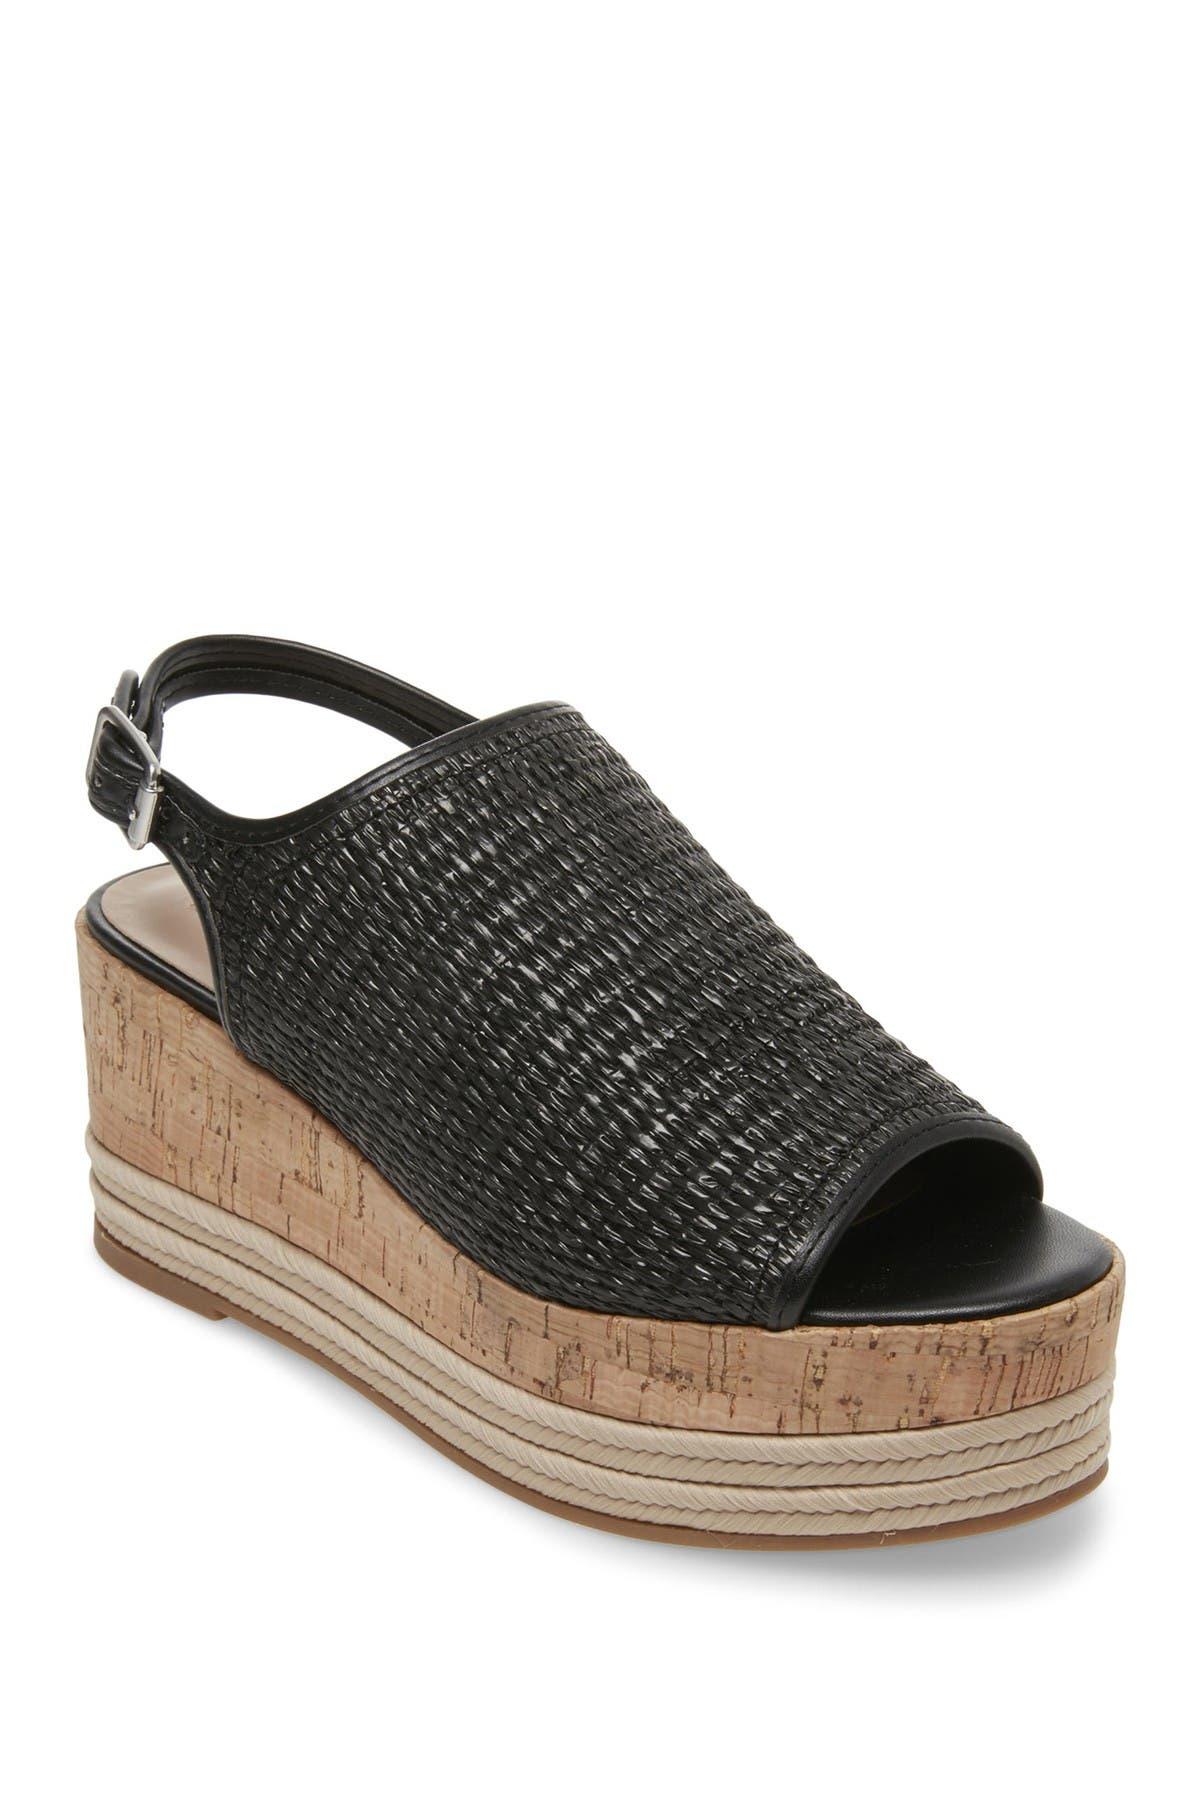 Carlton Platform Open Toe Wedge Sandal